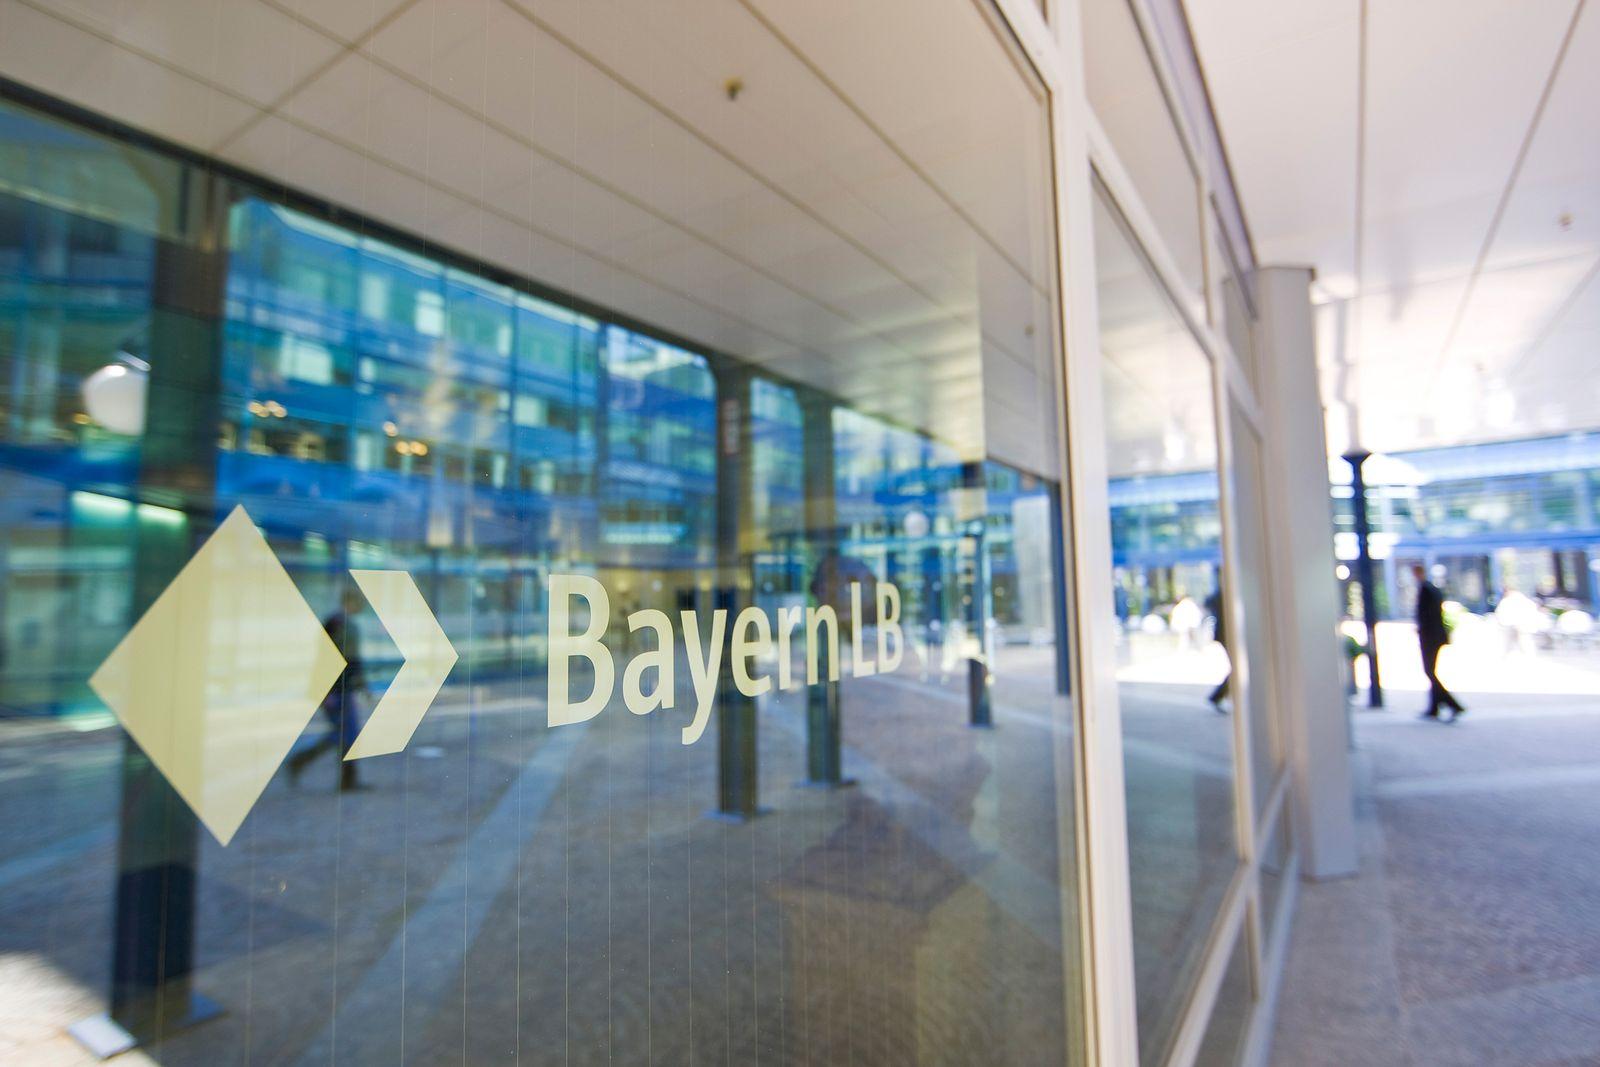 Bayern LB / Zentrale München